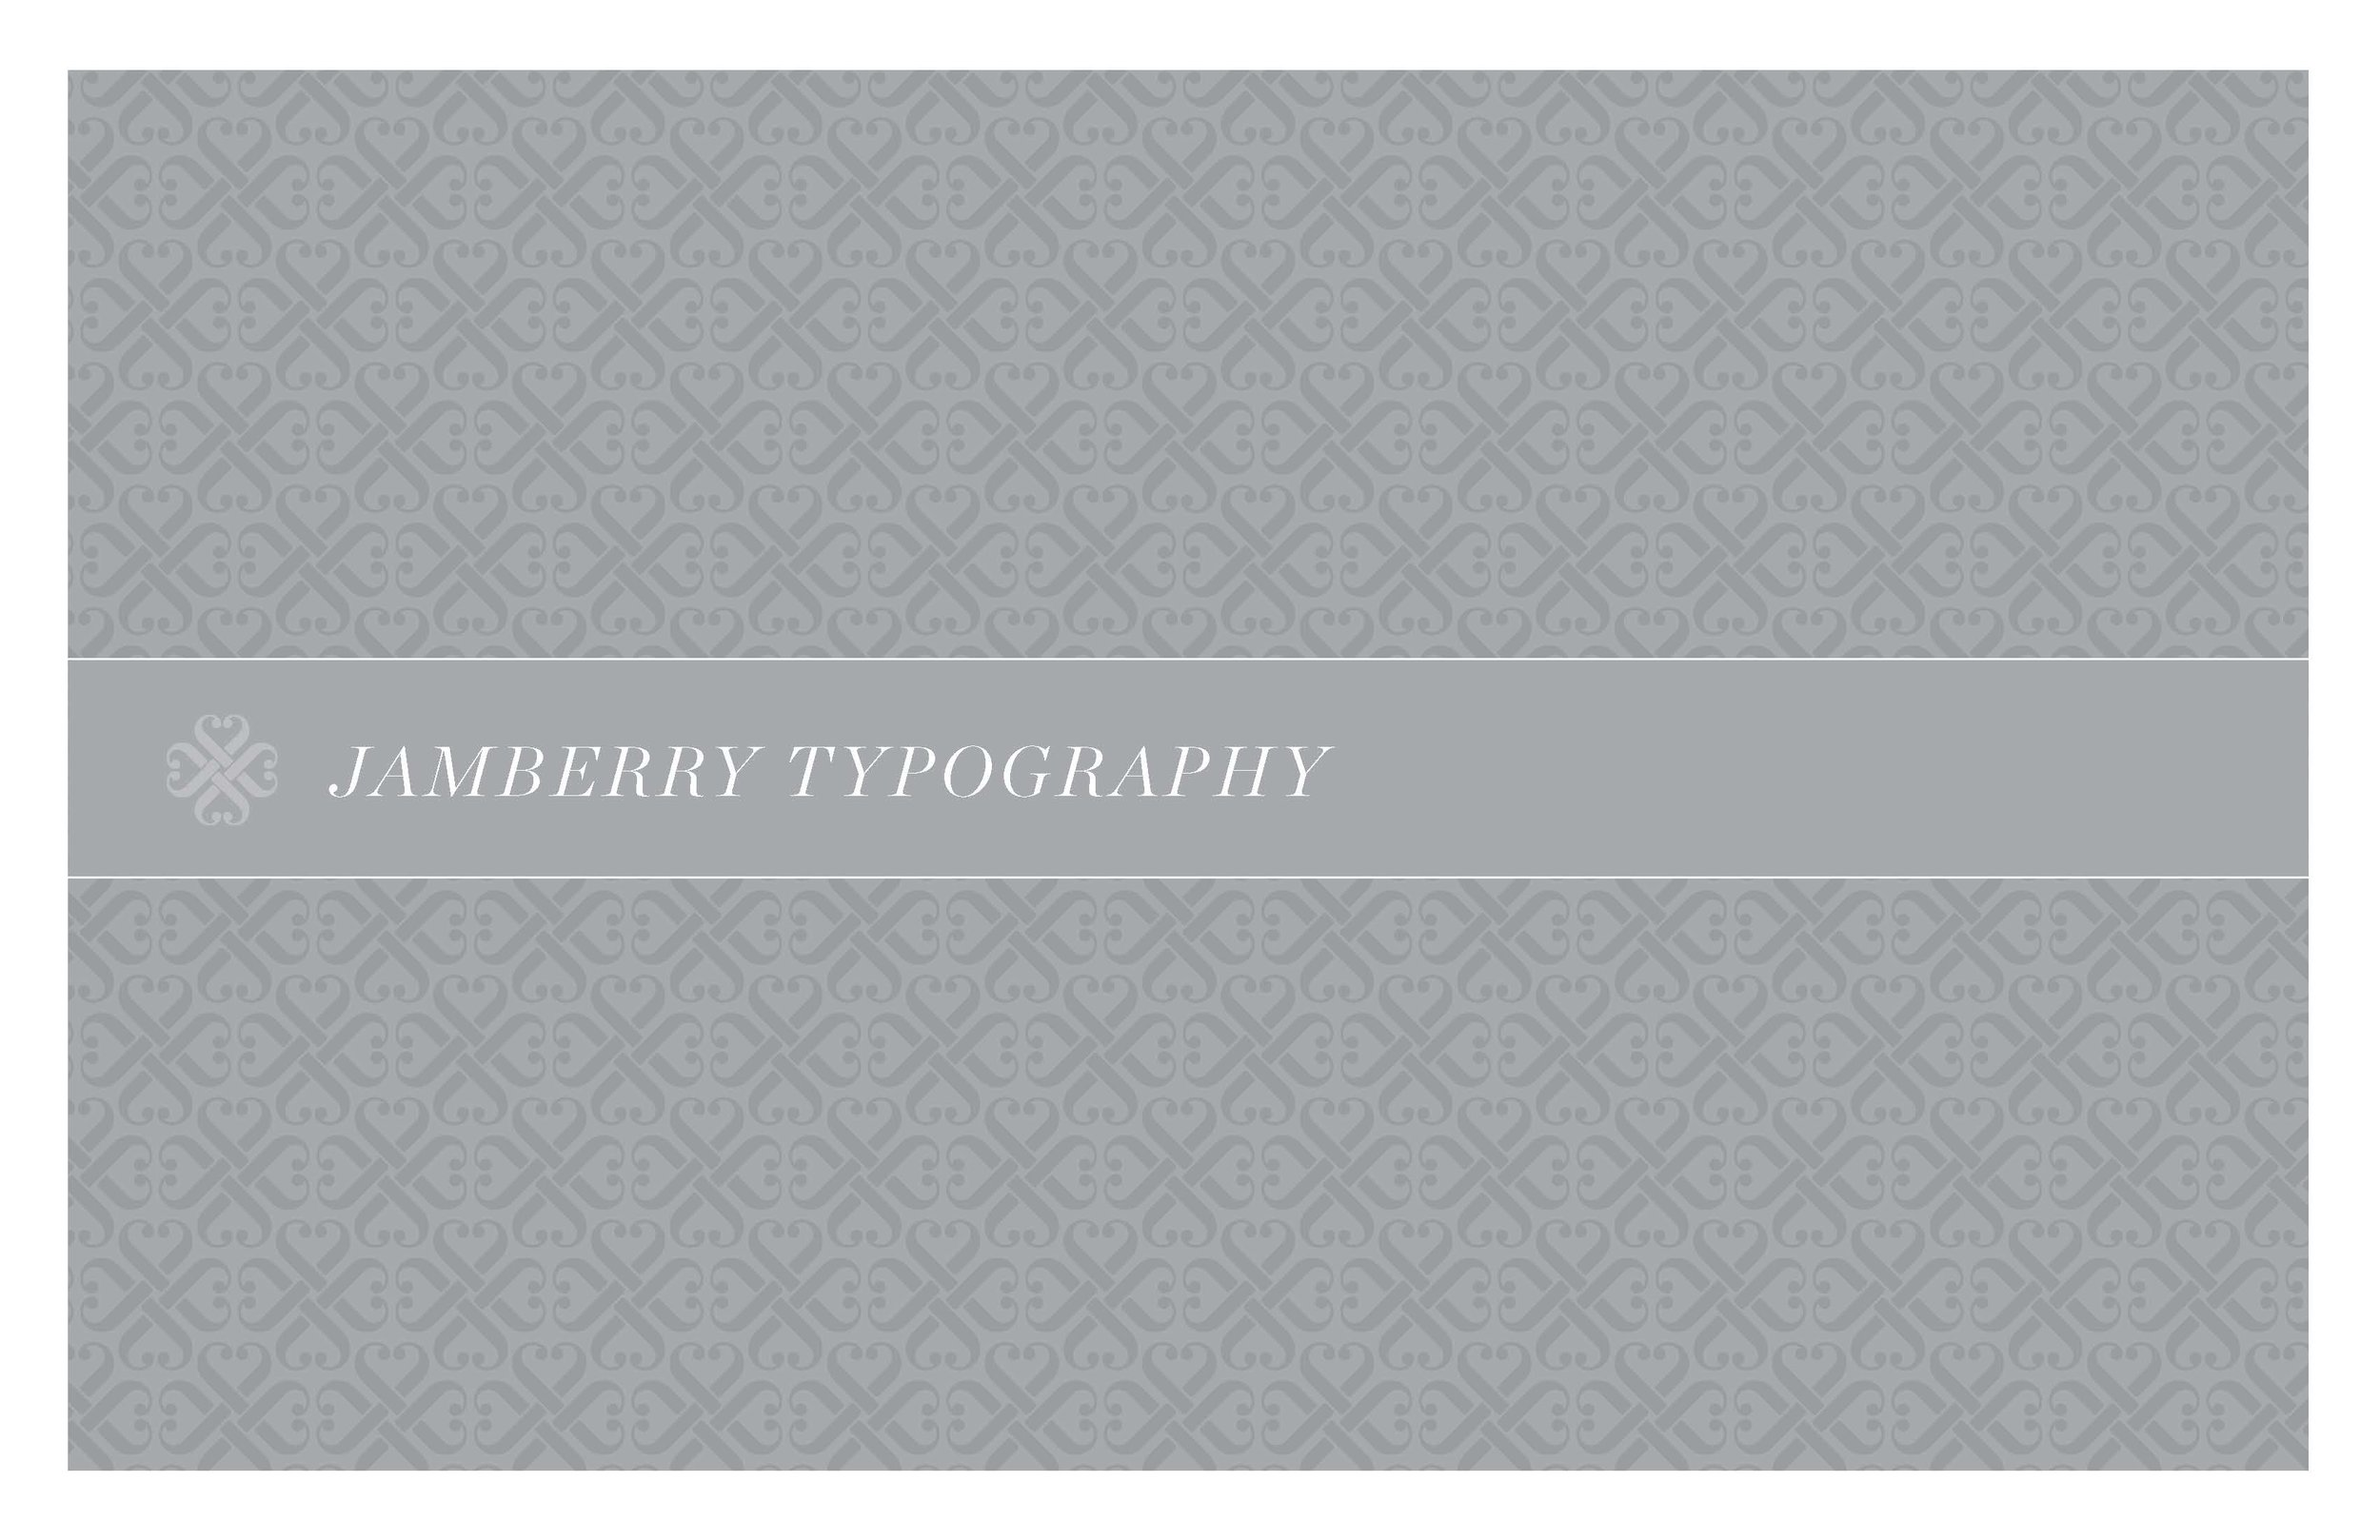 Jamberry GSG_v2.0_Page_09.jpg